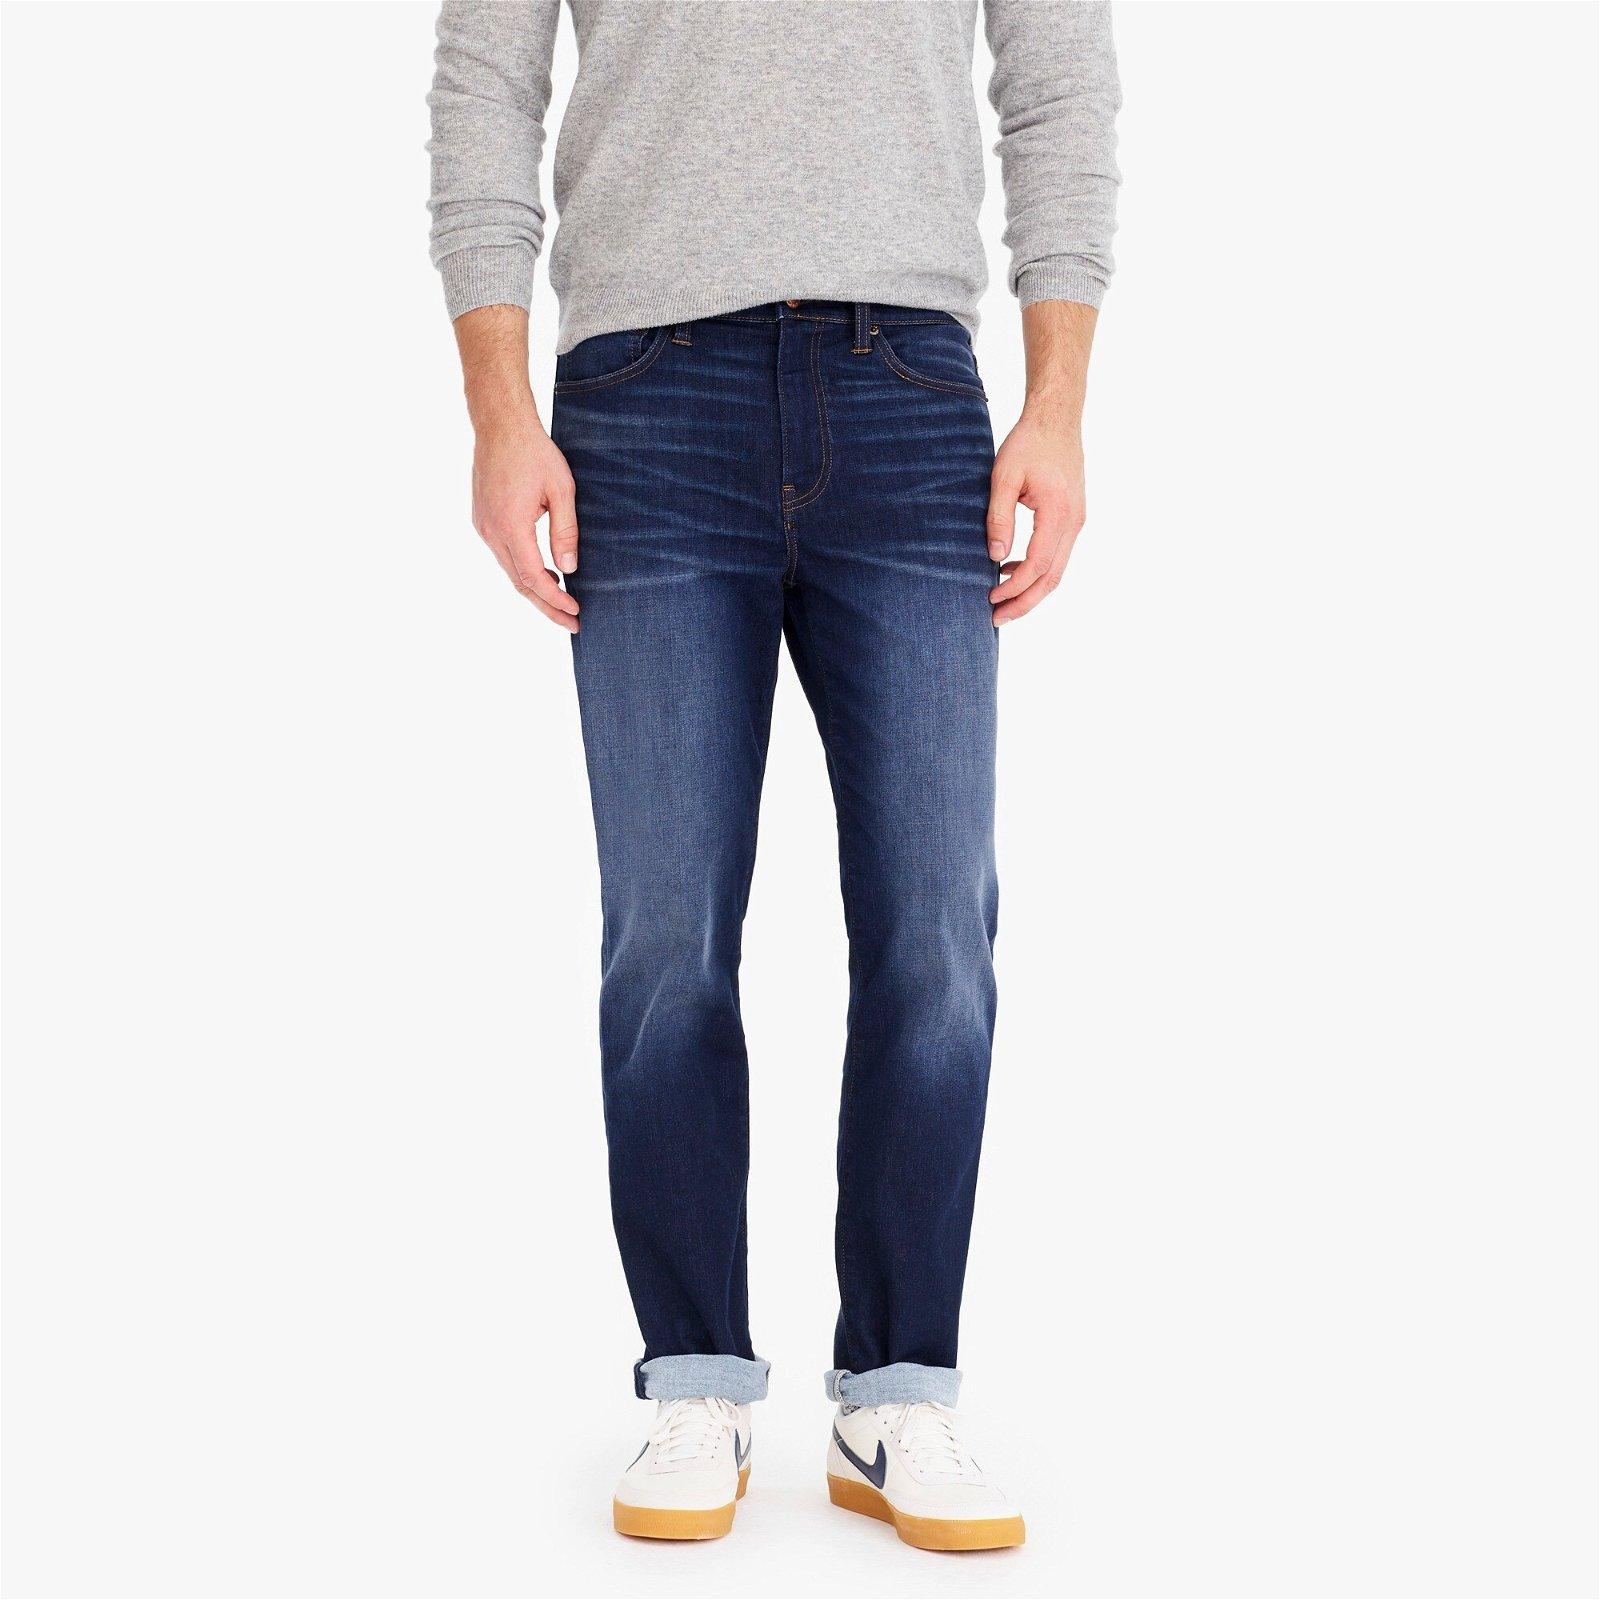 Destination 770 Straight-fit traveler jean in stretch THERMOLITE®